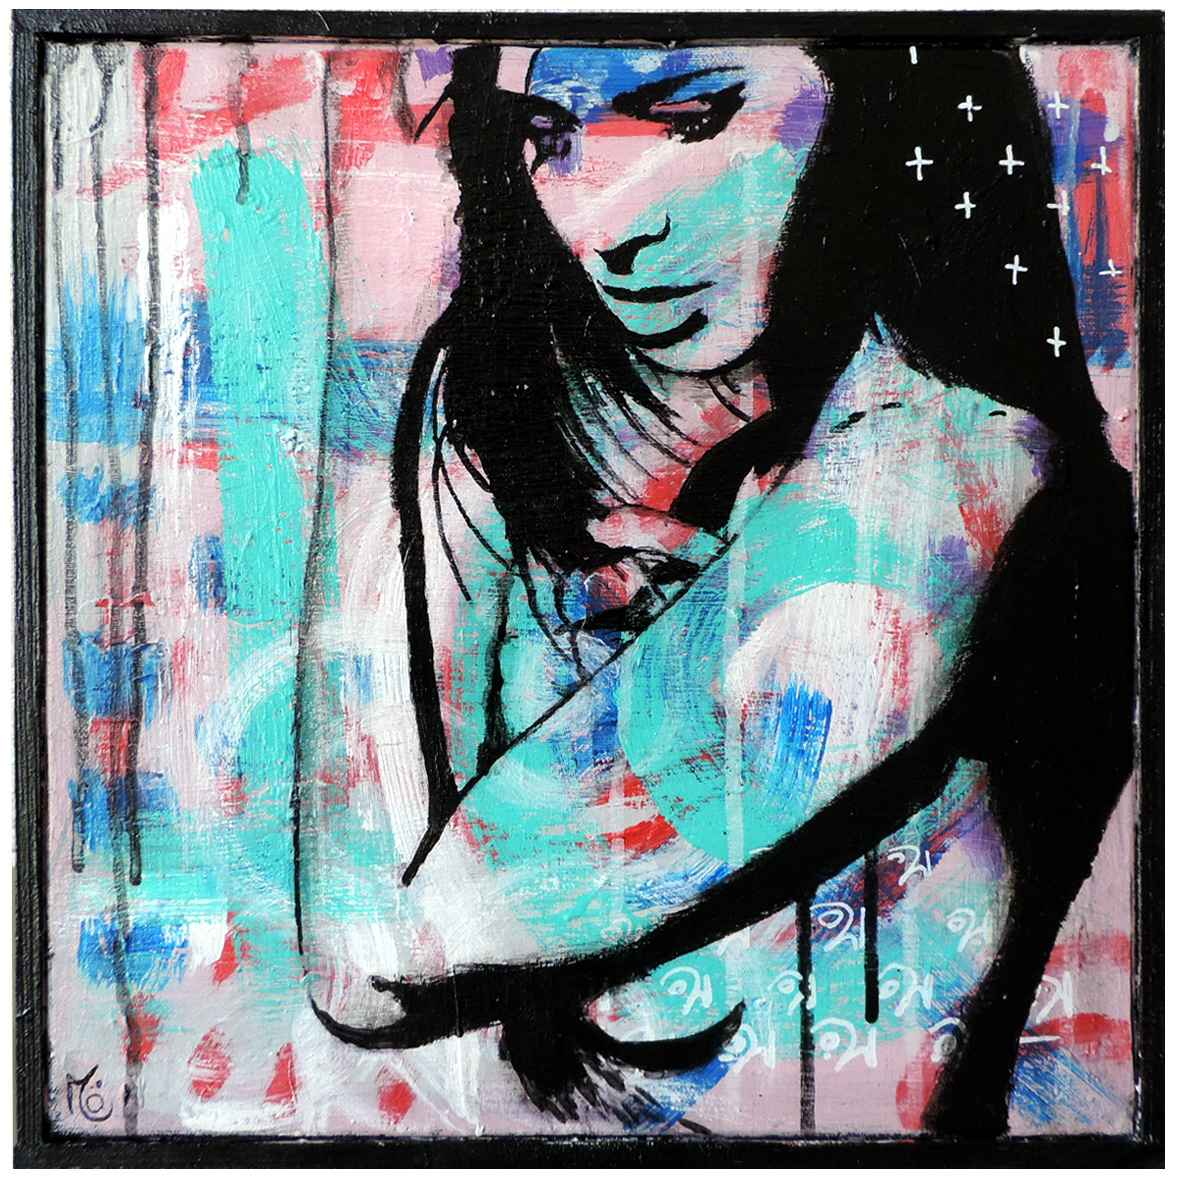 Blue body 1 by   MÖ - Masterpiece Online